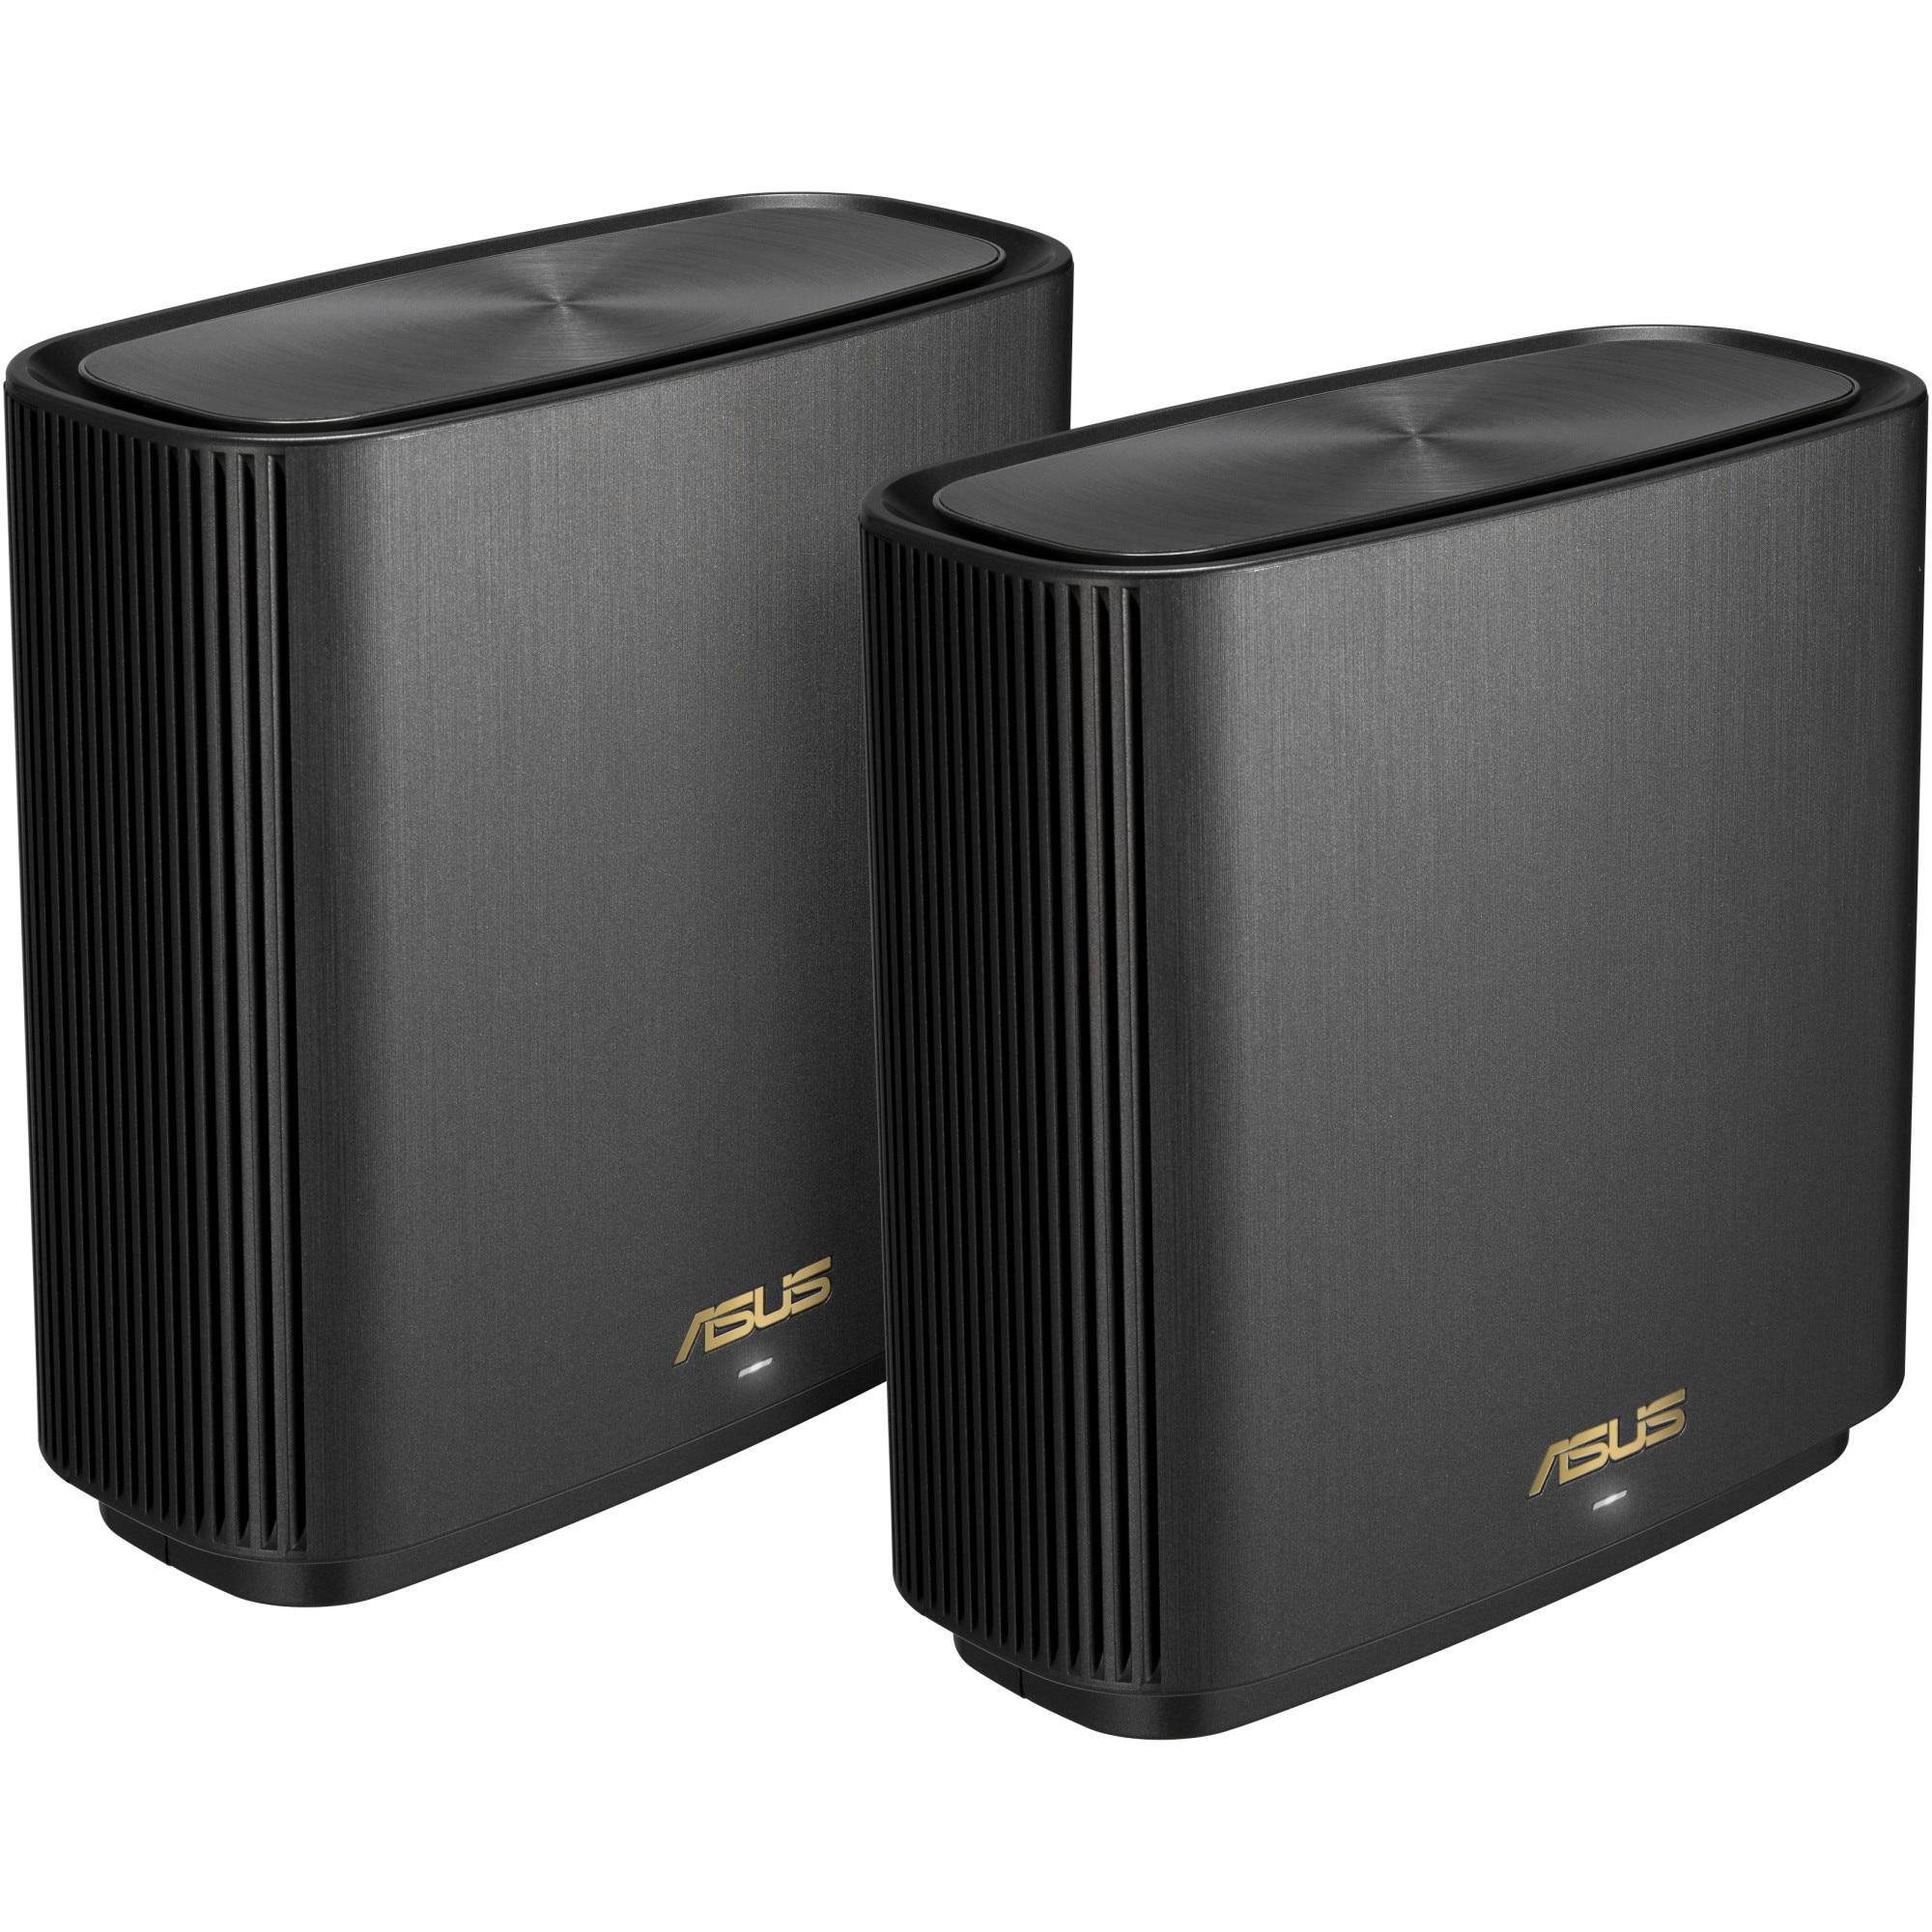 Fotografie Sistem Wi-Fi Mesh ASUS ZenWifi AX XT8, MU-MIMO, Black